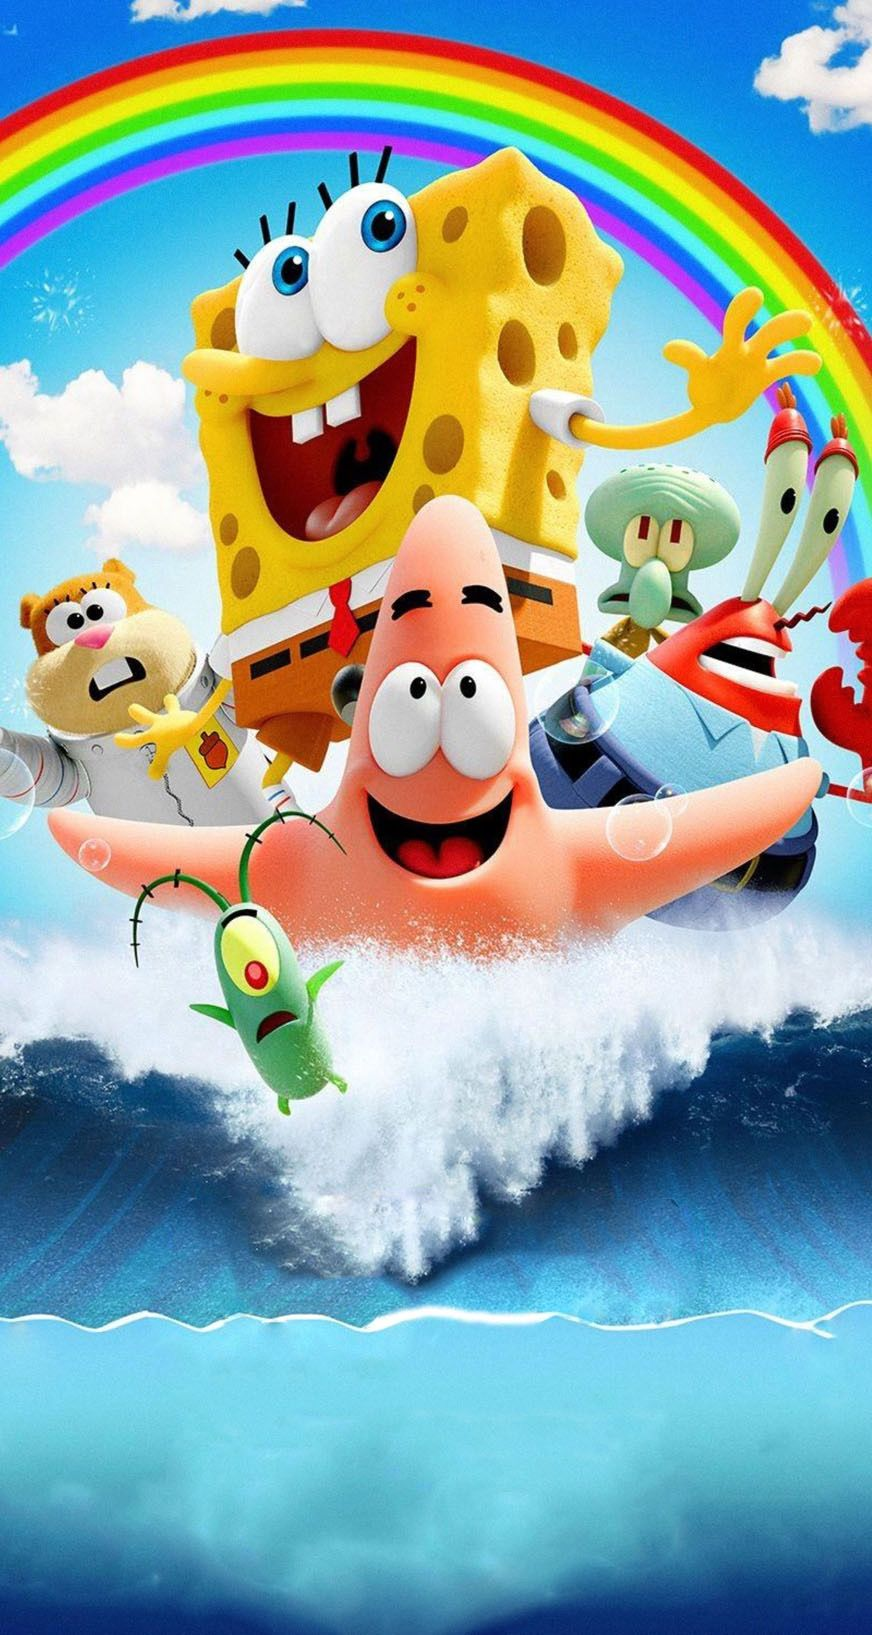 Pin De Facu Ayala En Spongebob Squarepants Bob Esponja Bob Esponja Personajes Pinturas Disney